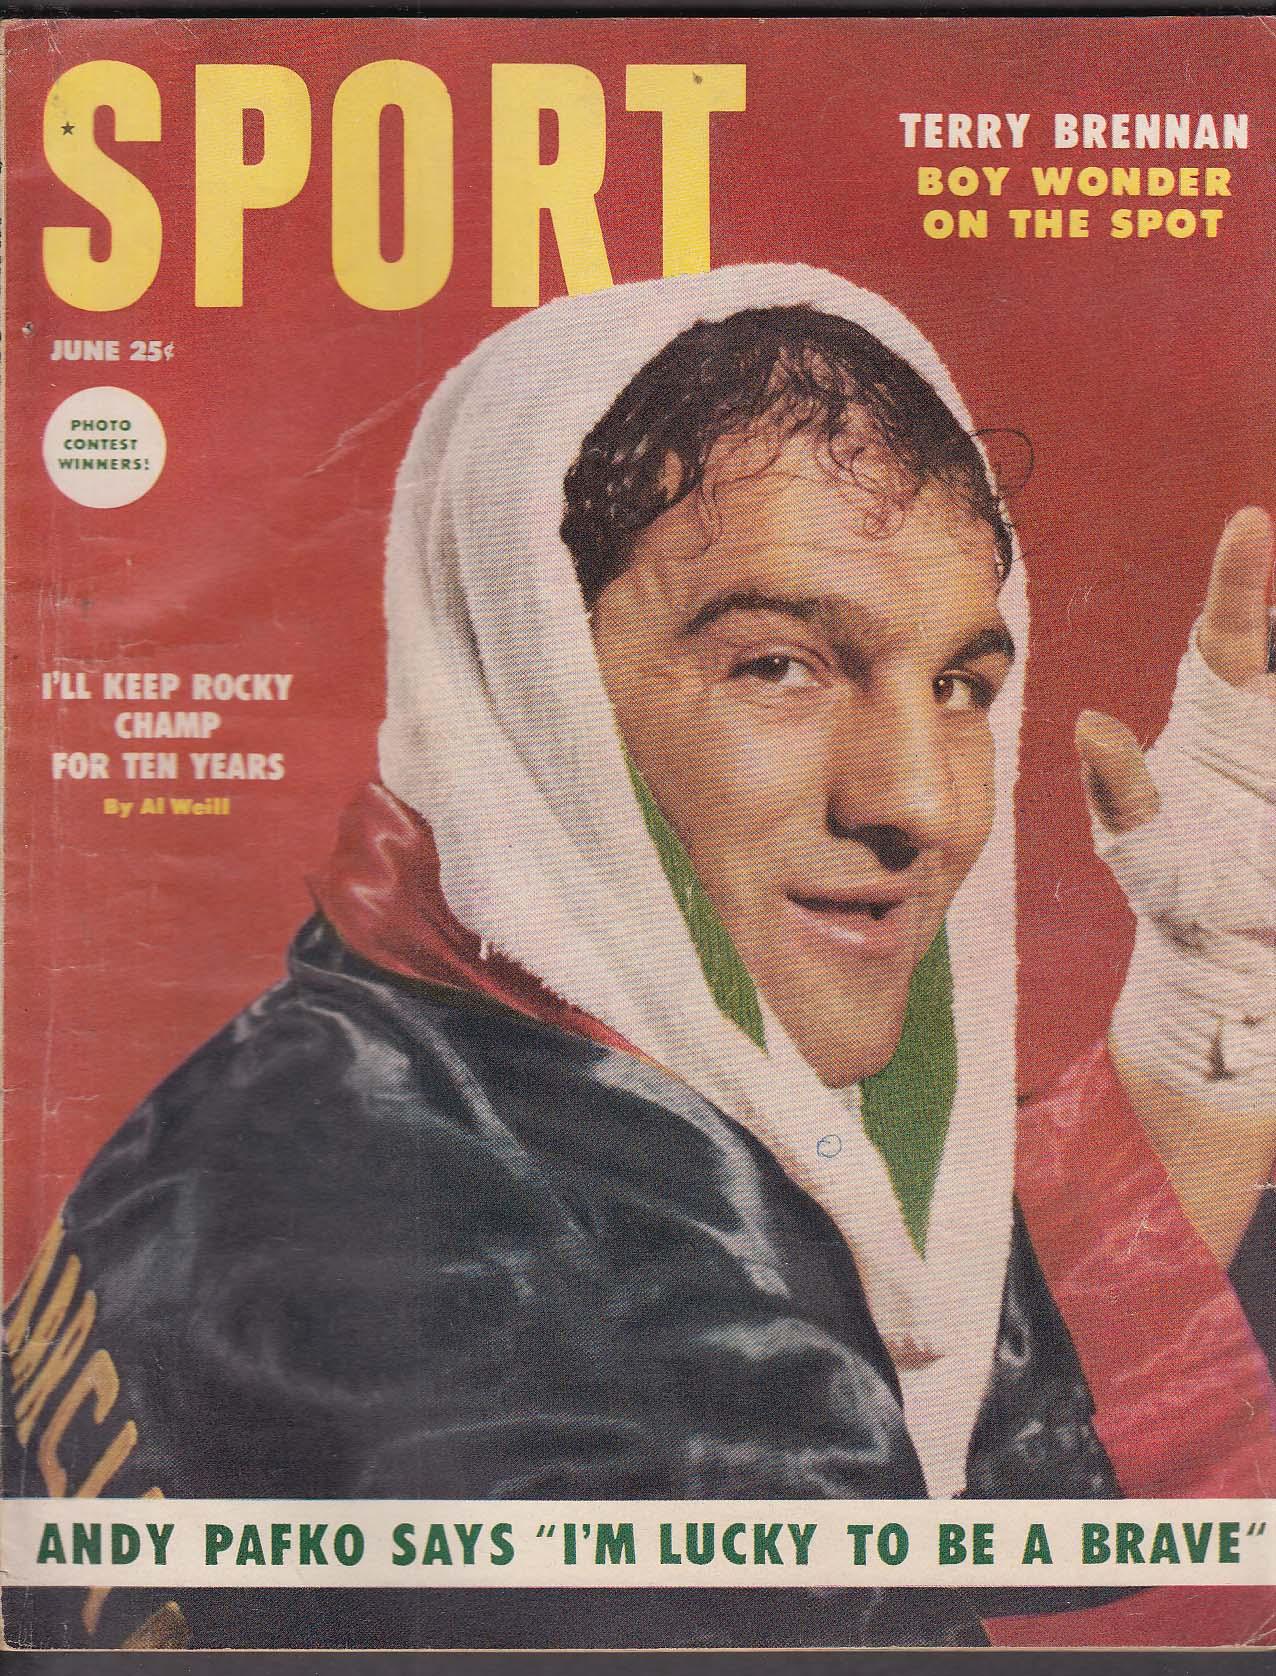 SPORT Rocky Maricano Andy Pafko Terry Brennan ++ 6 1954